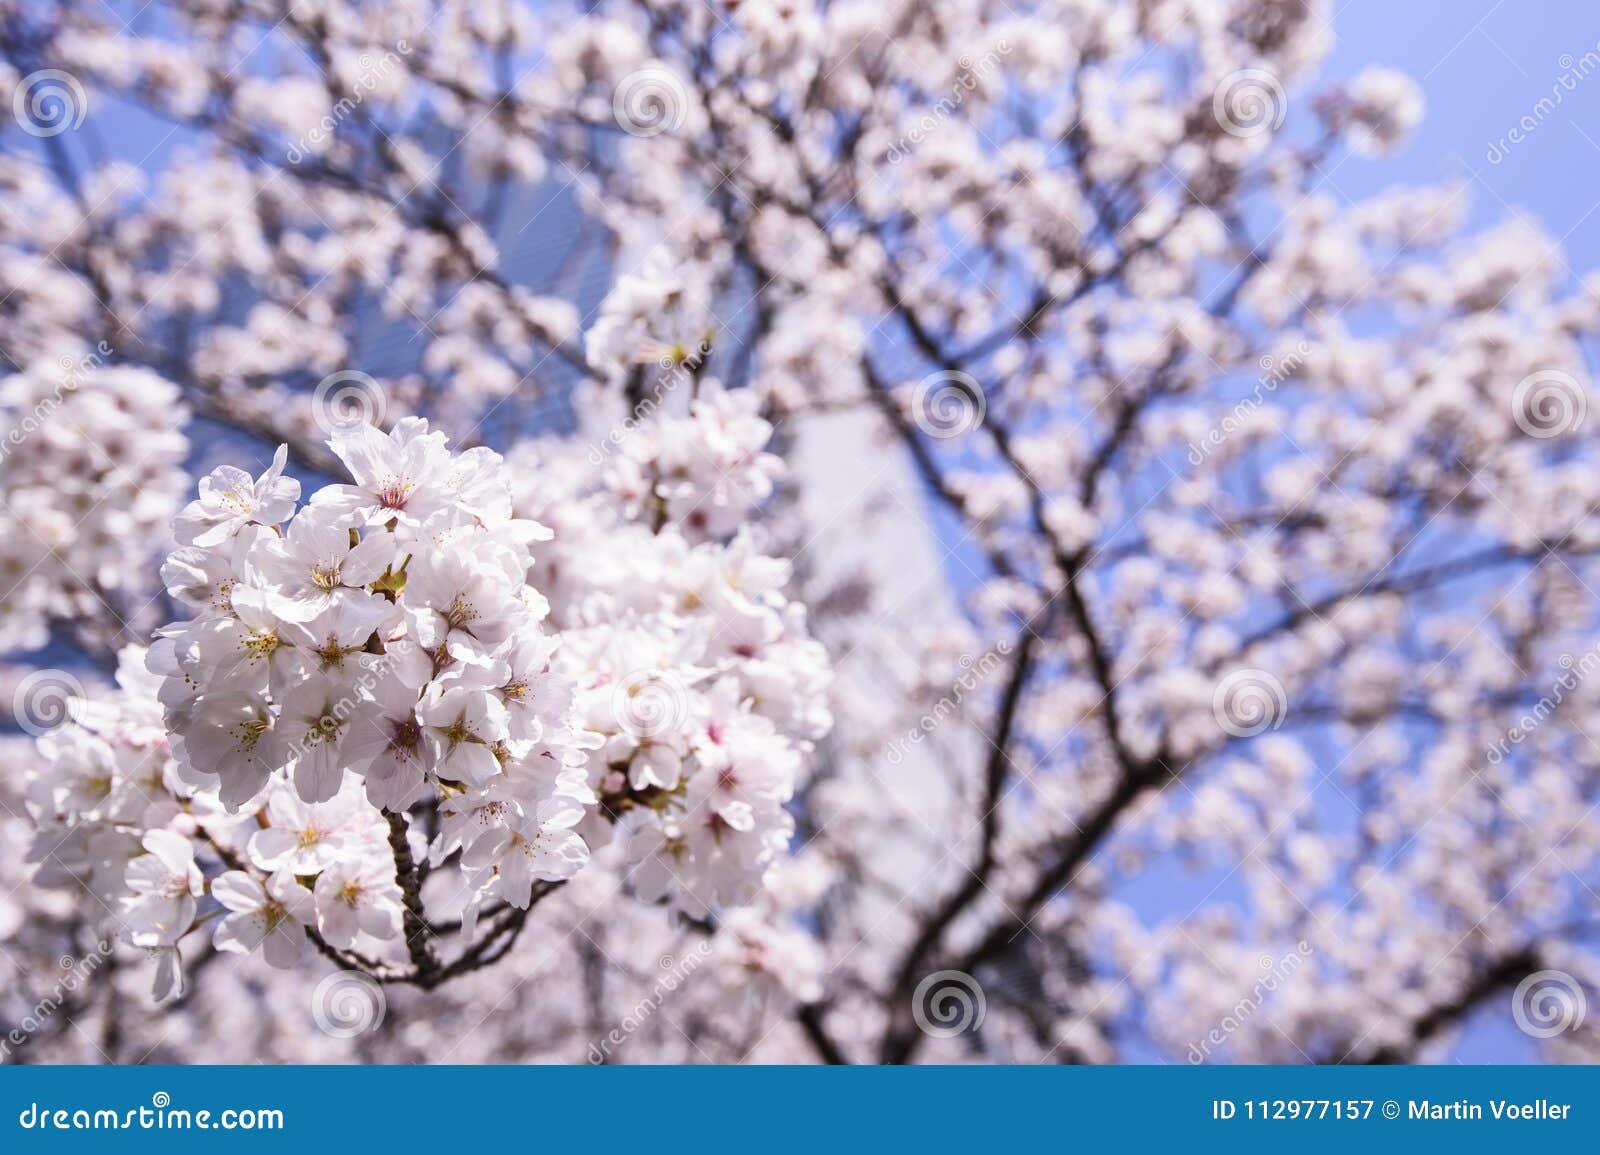 Beautiful Sakura Cherry Blossoms in Tokyo, Japan